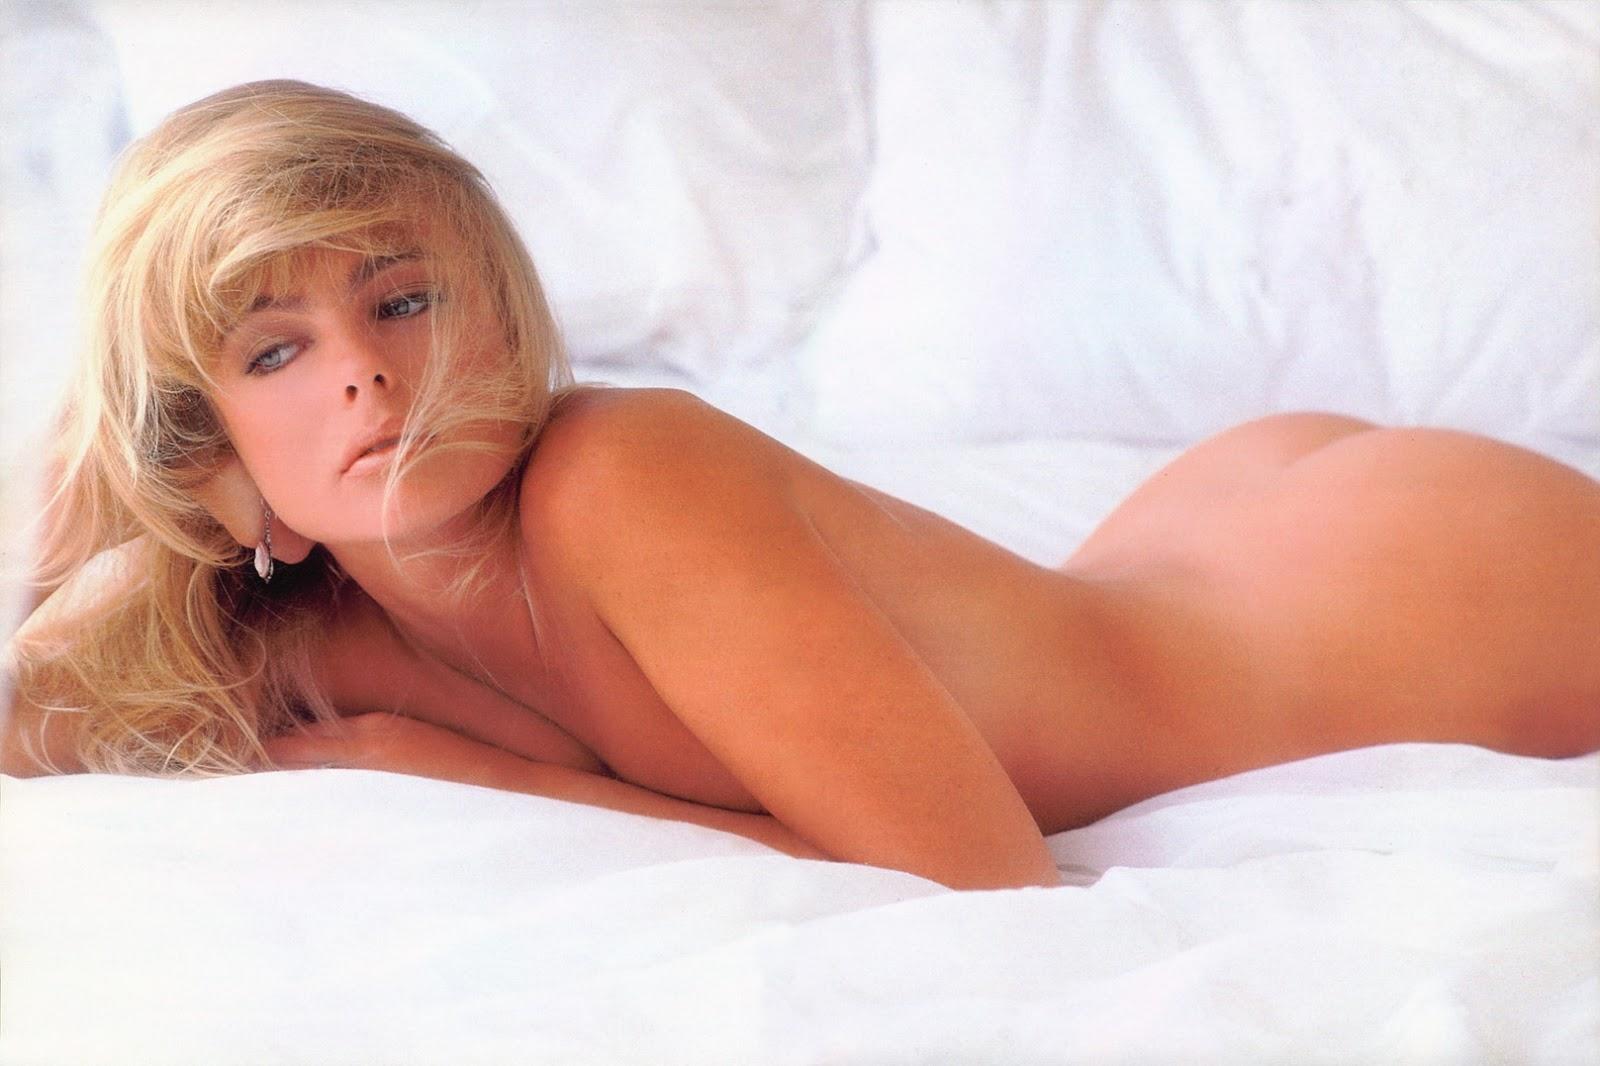 Free nude erika eleniak picture